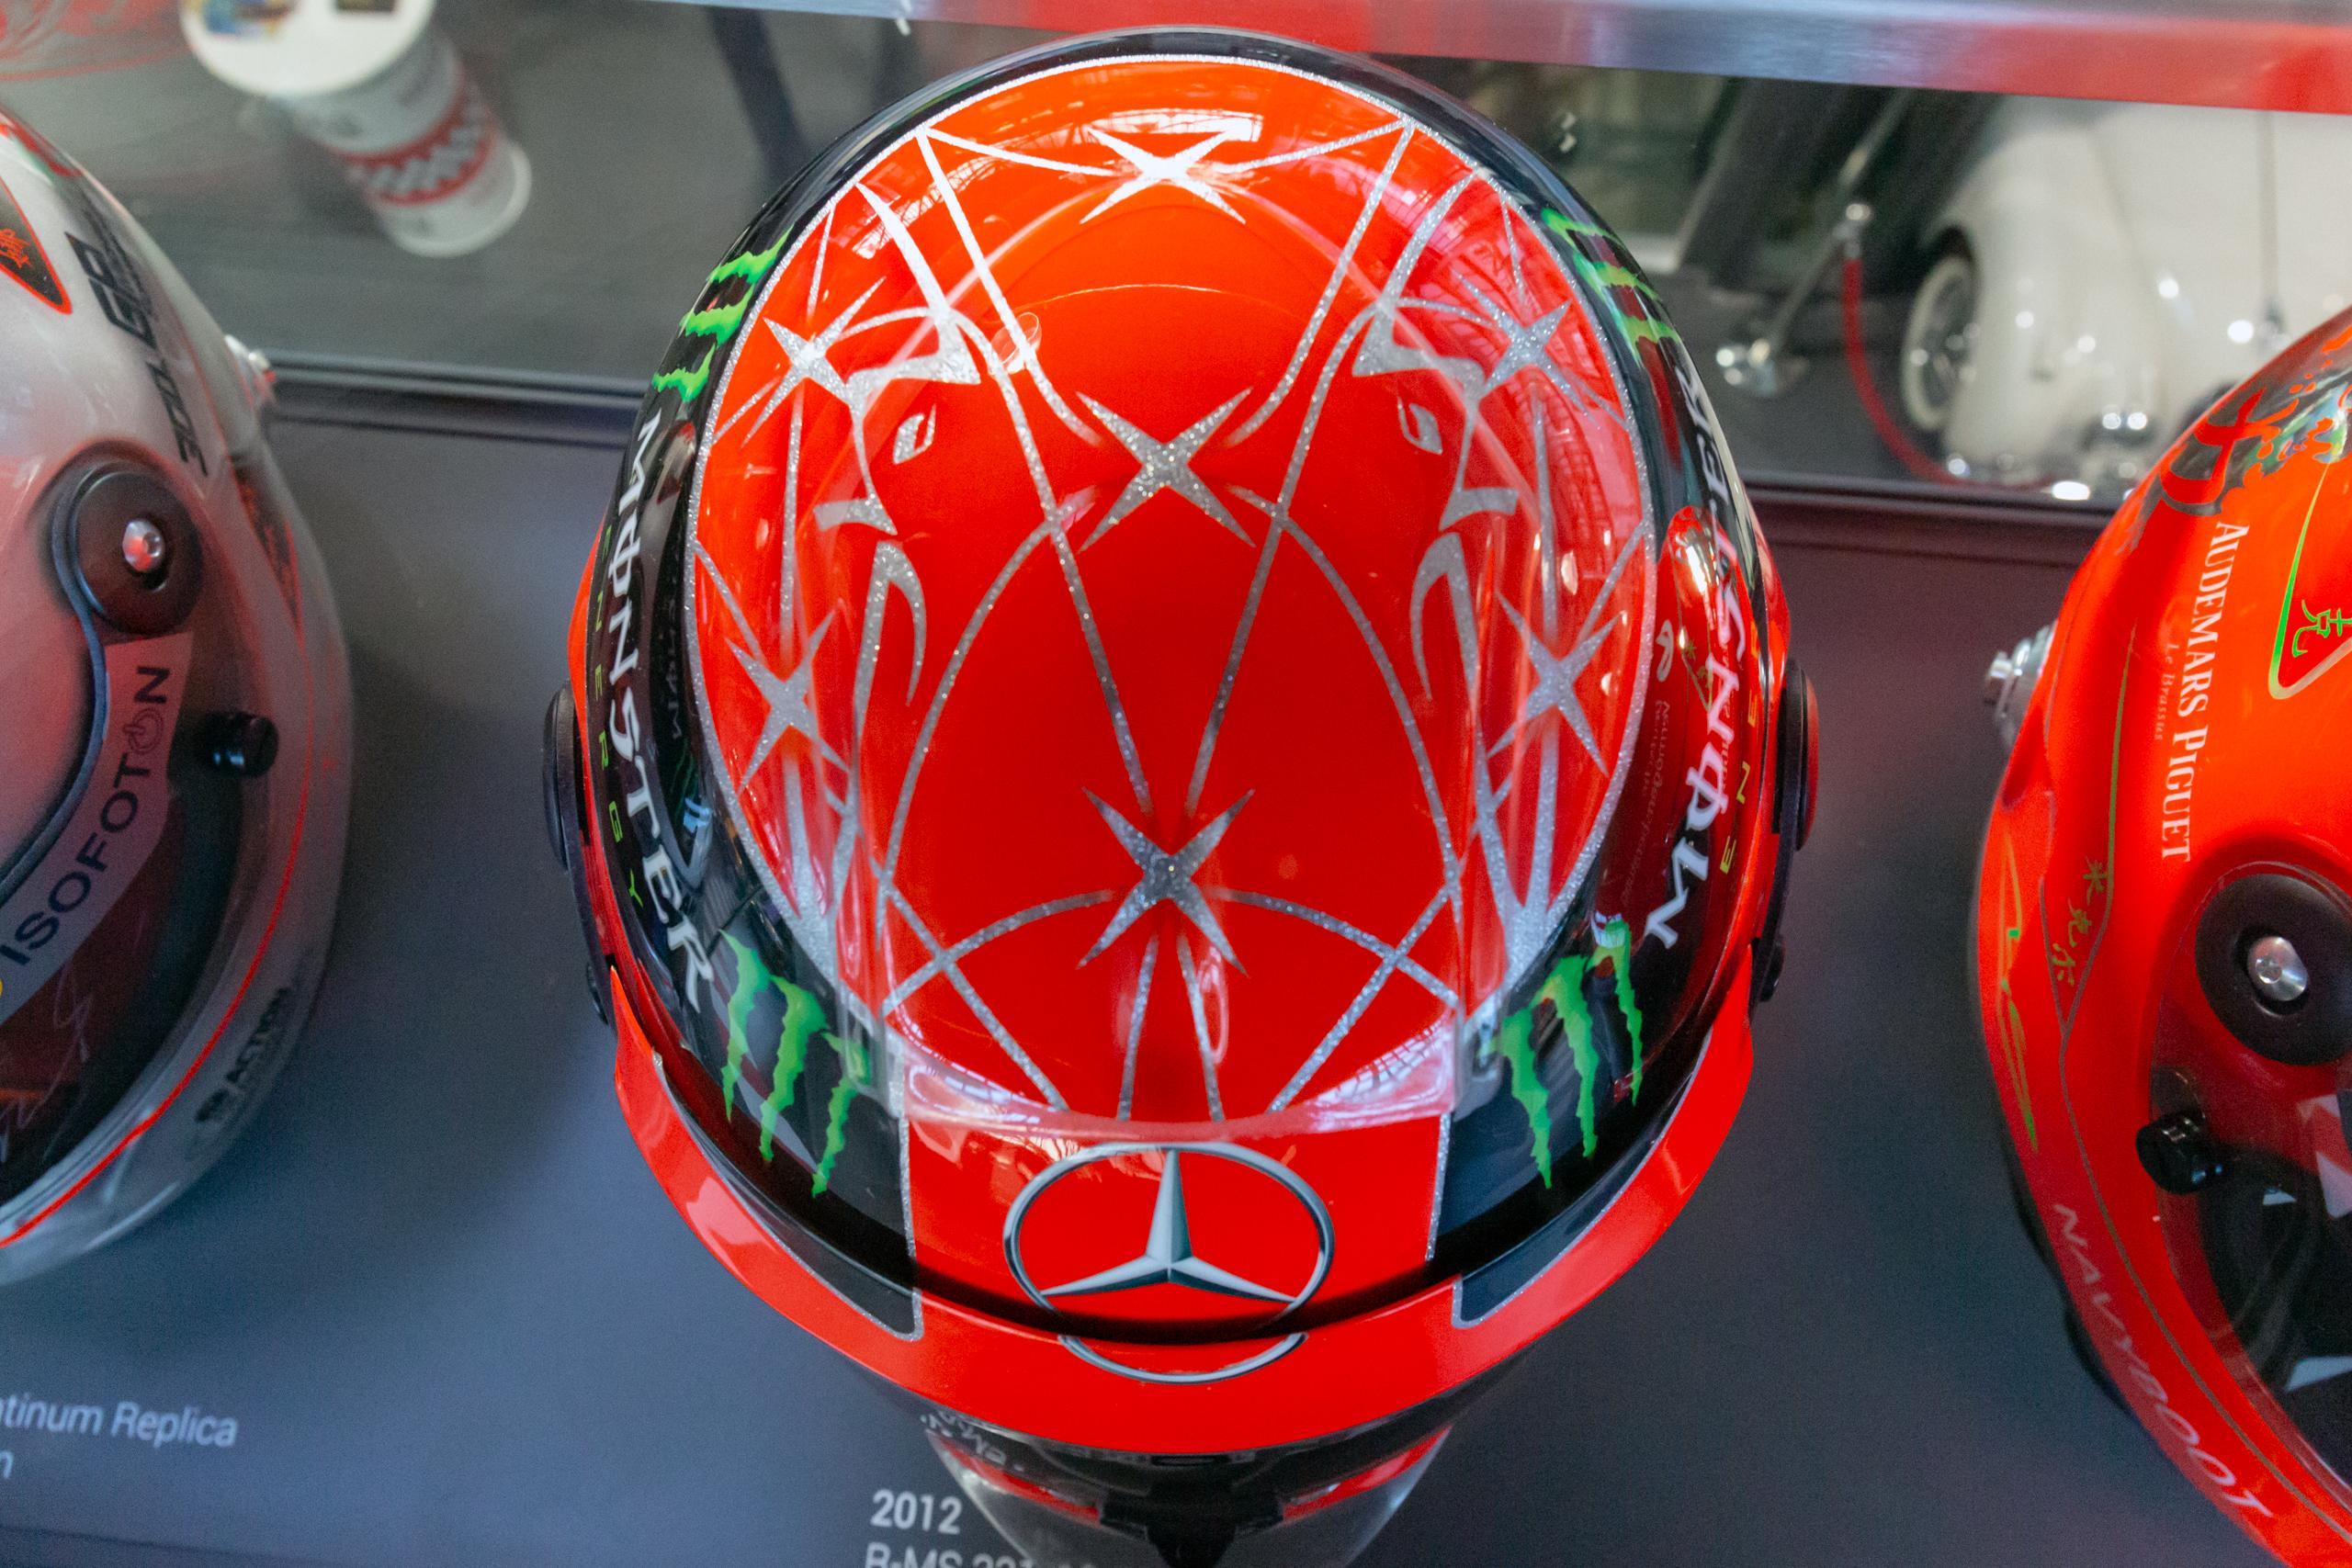 File Michael Schumacher 2012 Brazilian Gp Helmet Top 2019 Michael Schumacher Private Collection Jpg Wikimedia Commons